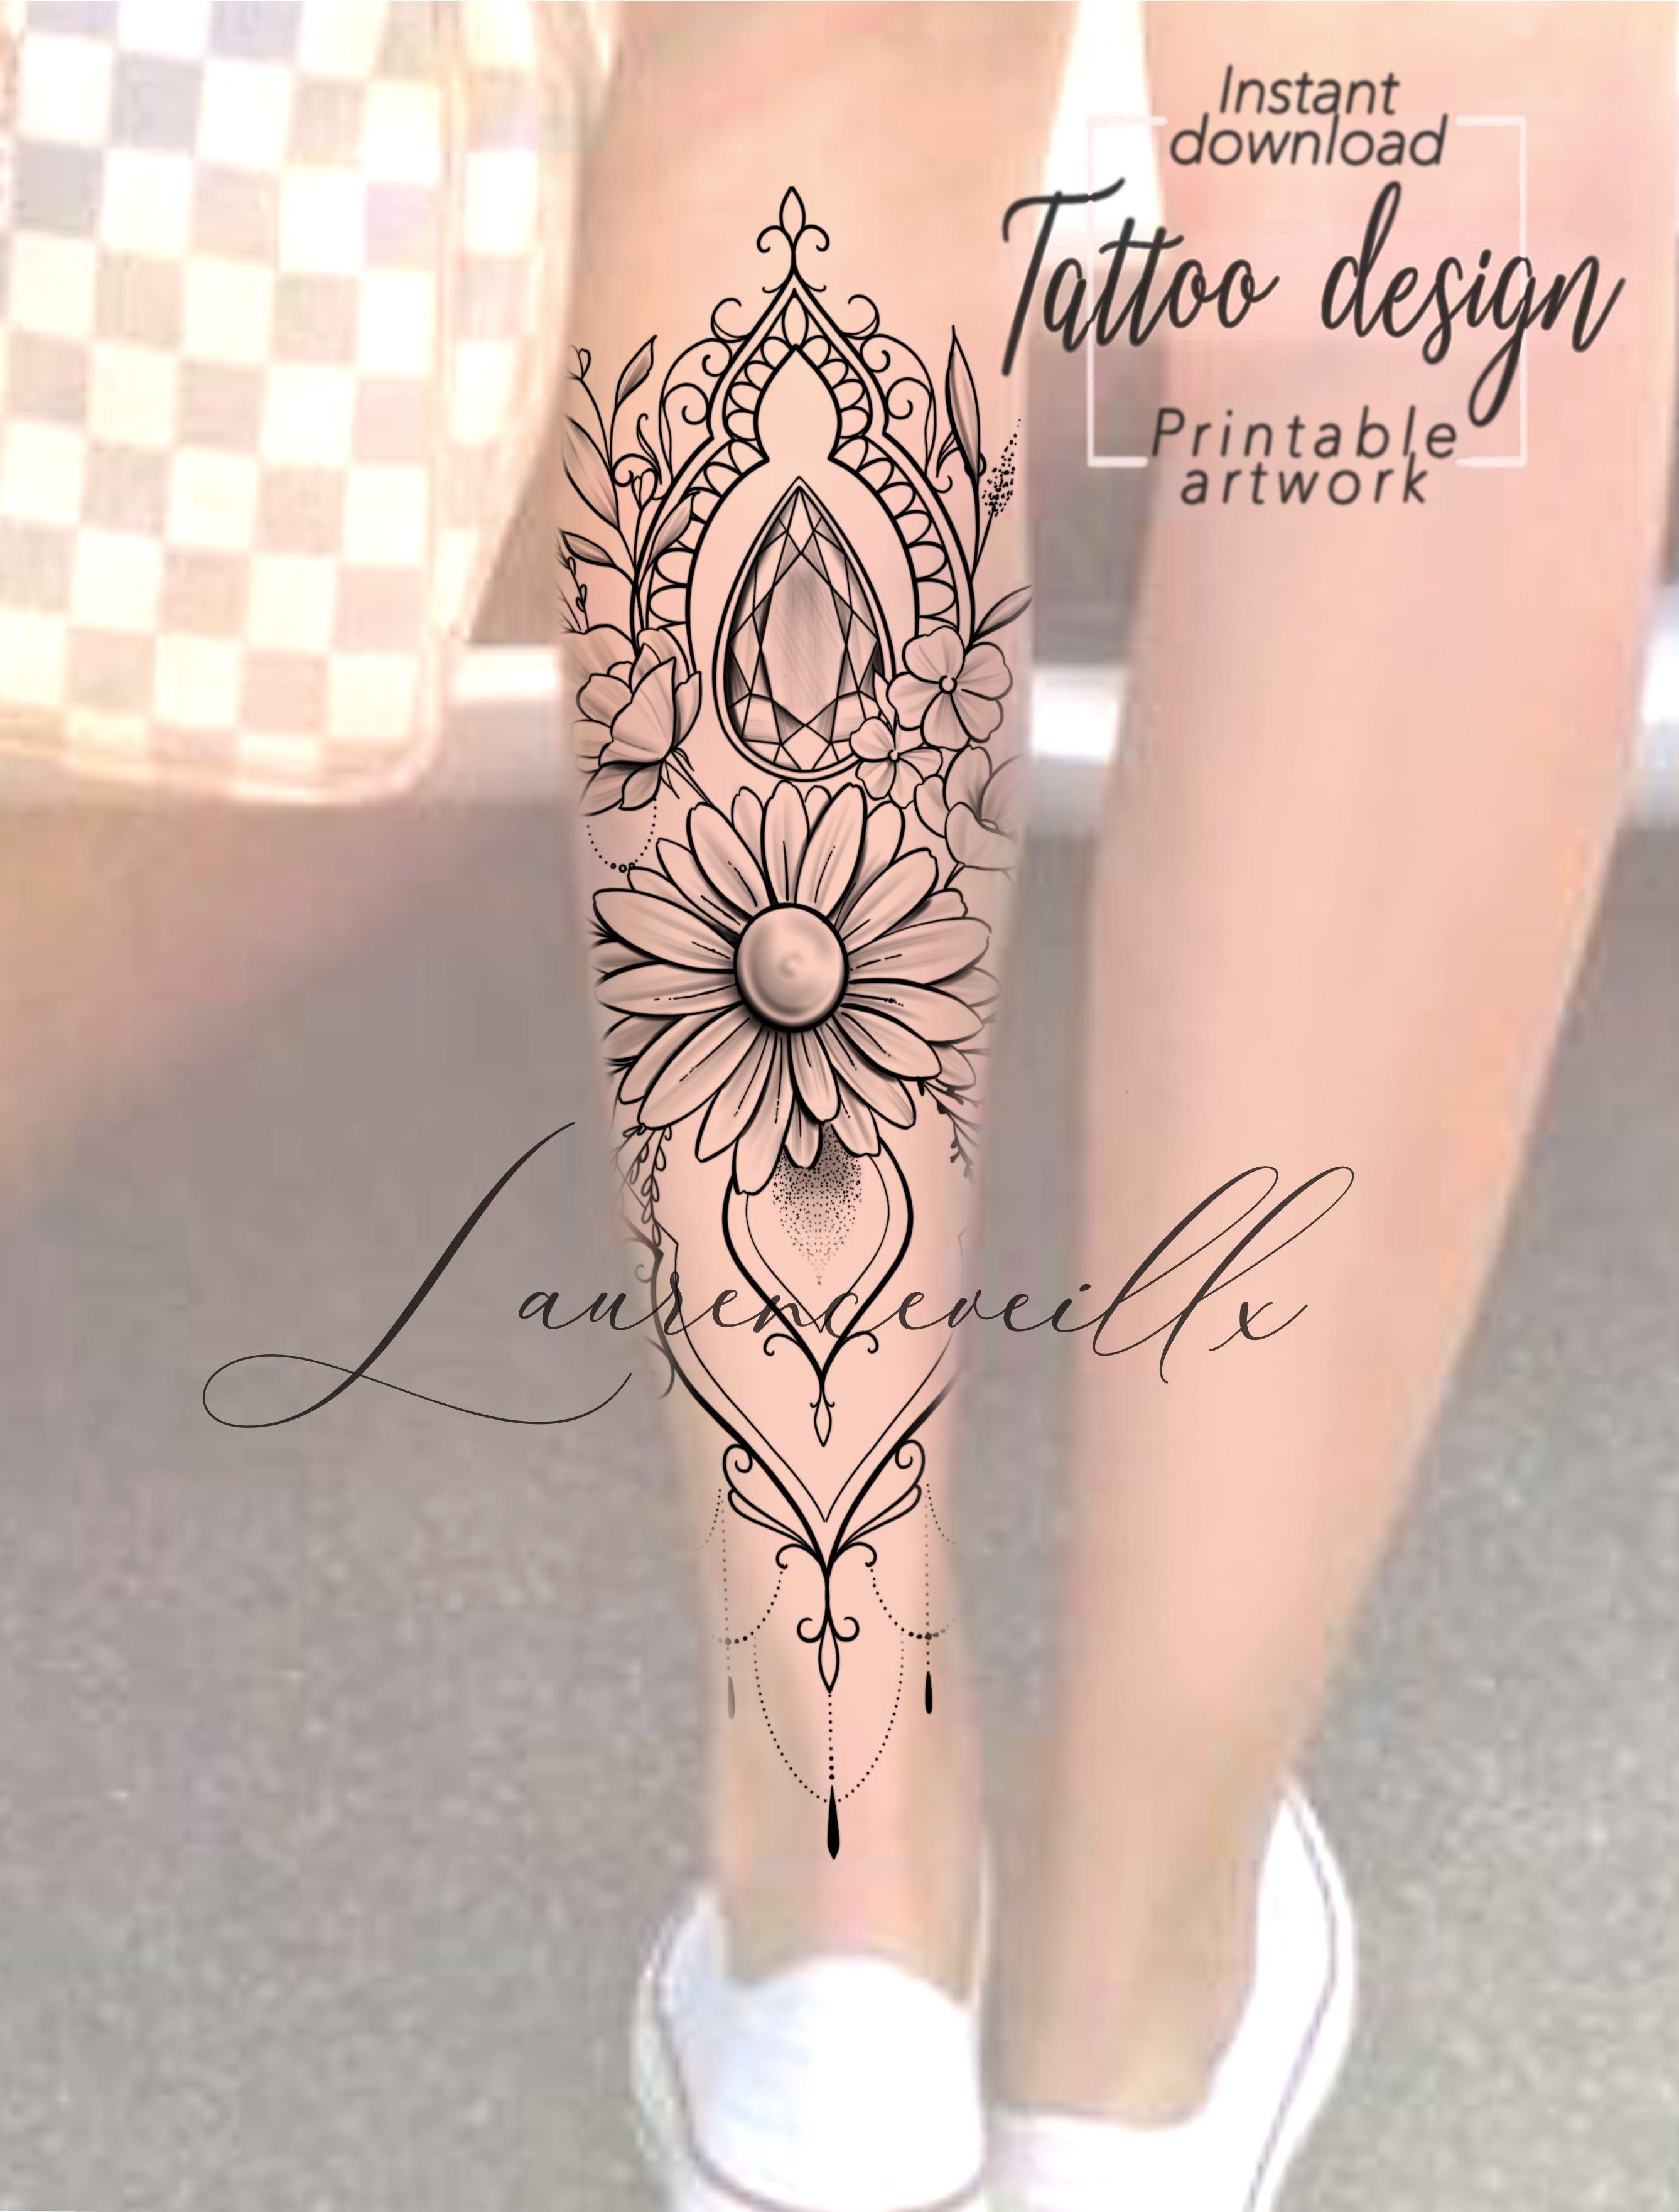 Daisy Flower Leg Tattoo Design For Woman Design Available On Etsy Laurenceveillx Tattoo Designs Sleeve Tattoos Printable Tattoos